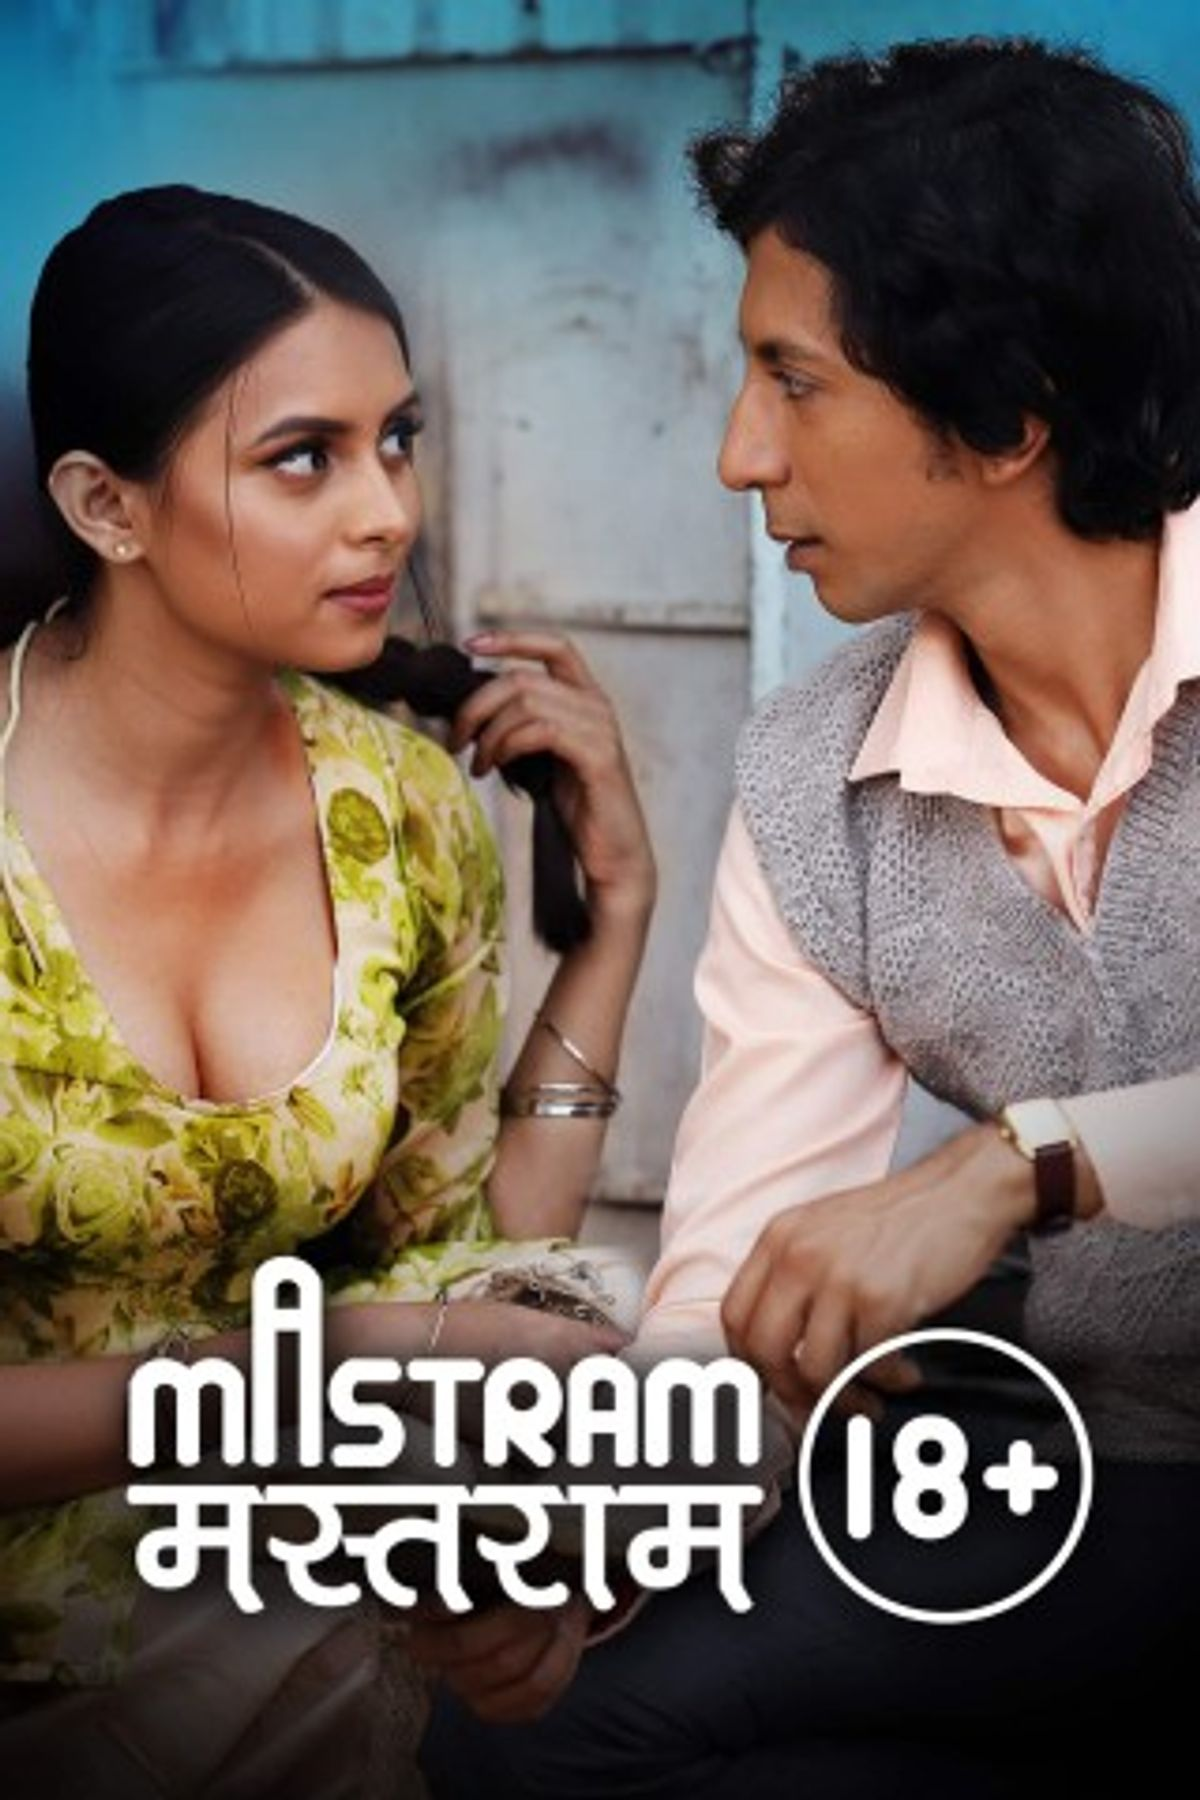 Jagat Rawat Best Movies, TV Shows and Web Series List